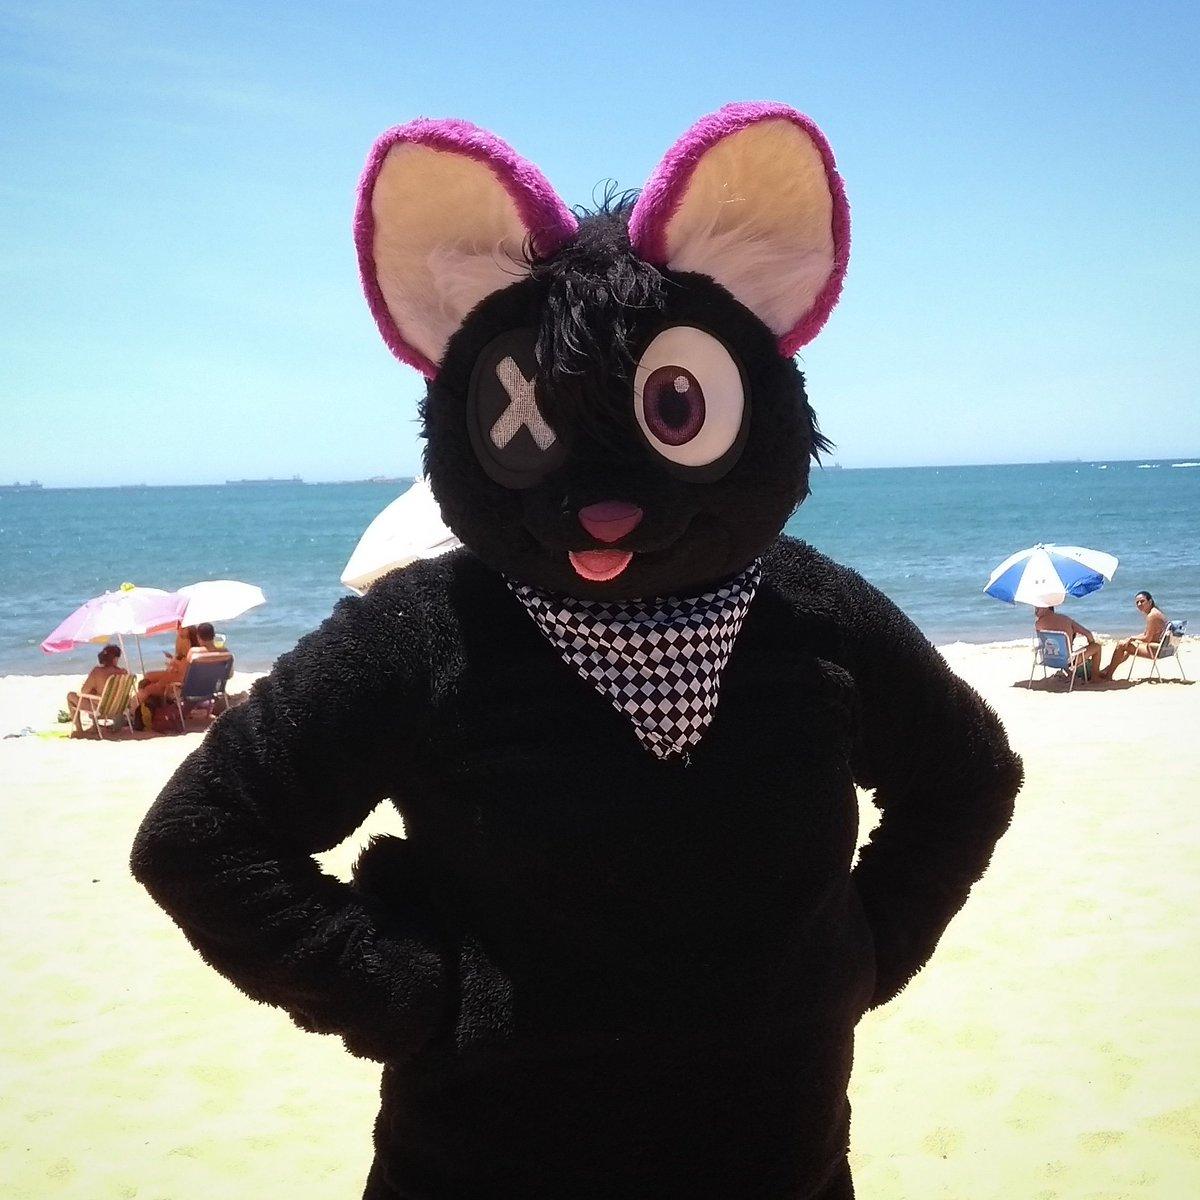 #furry #fursuit #furryfandom #fursuiter #fluffy #cute #kawaii #cosplay #praia #beach #fursuitbeach #praiadacosta #kyoki #cat #gato #nekopic.twitter.com/tOSxFq1ktH